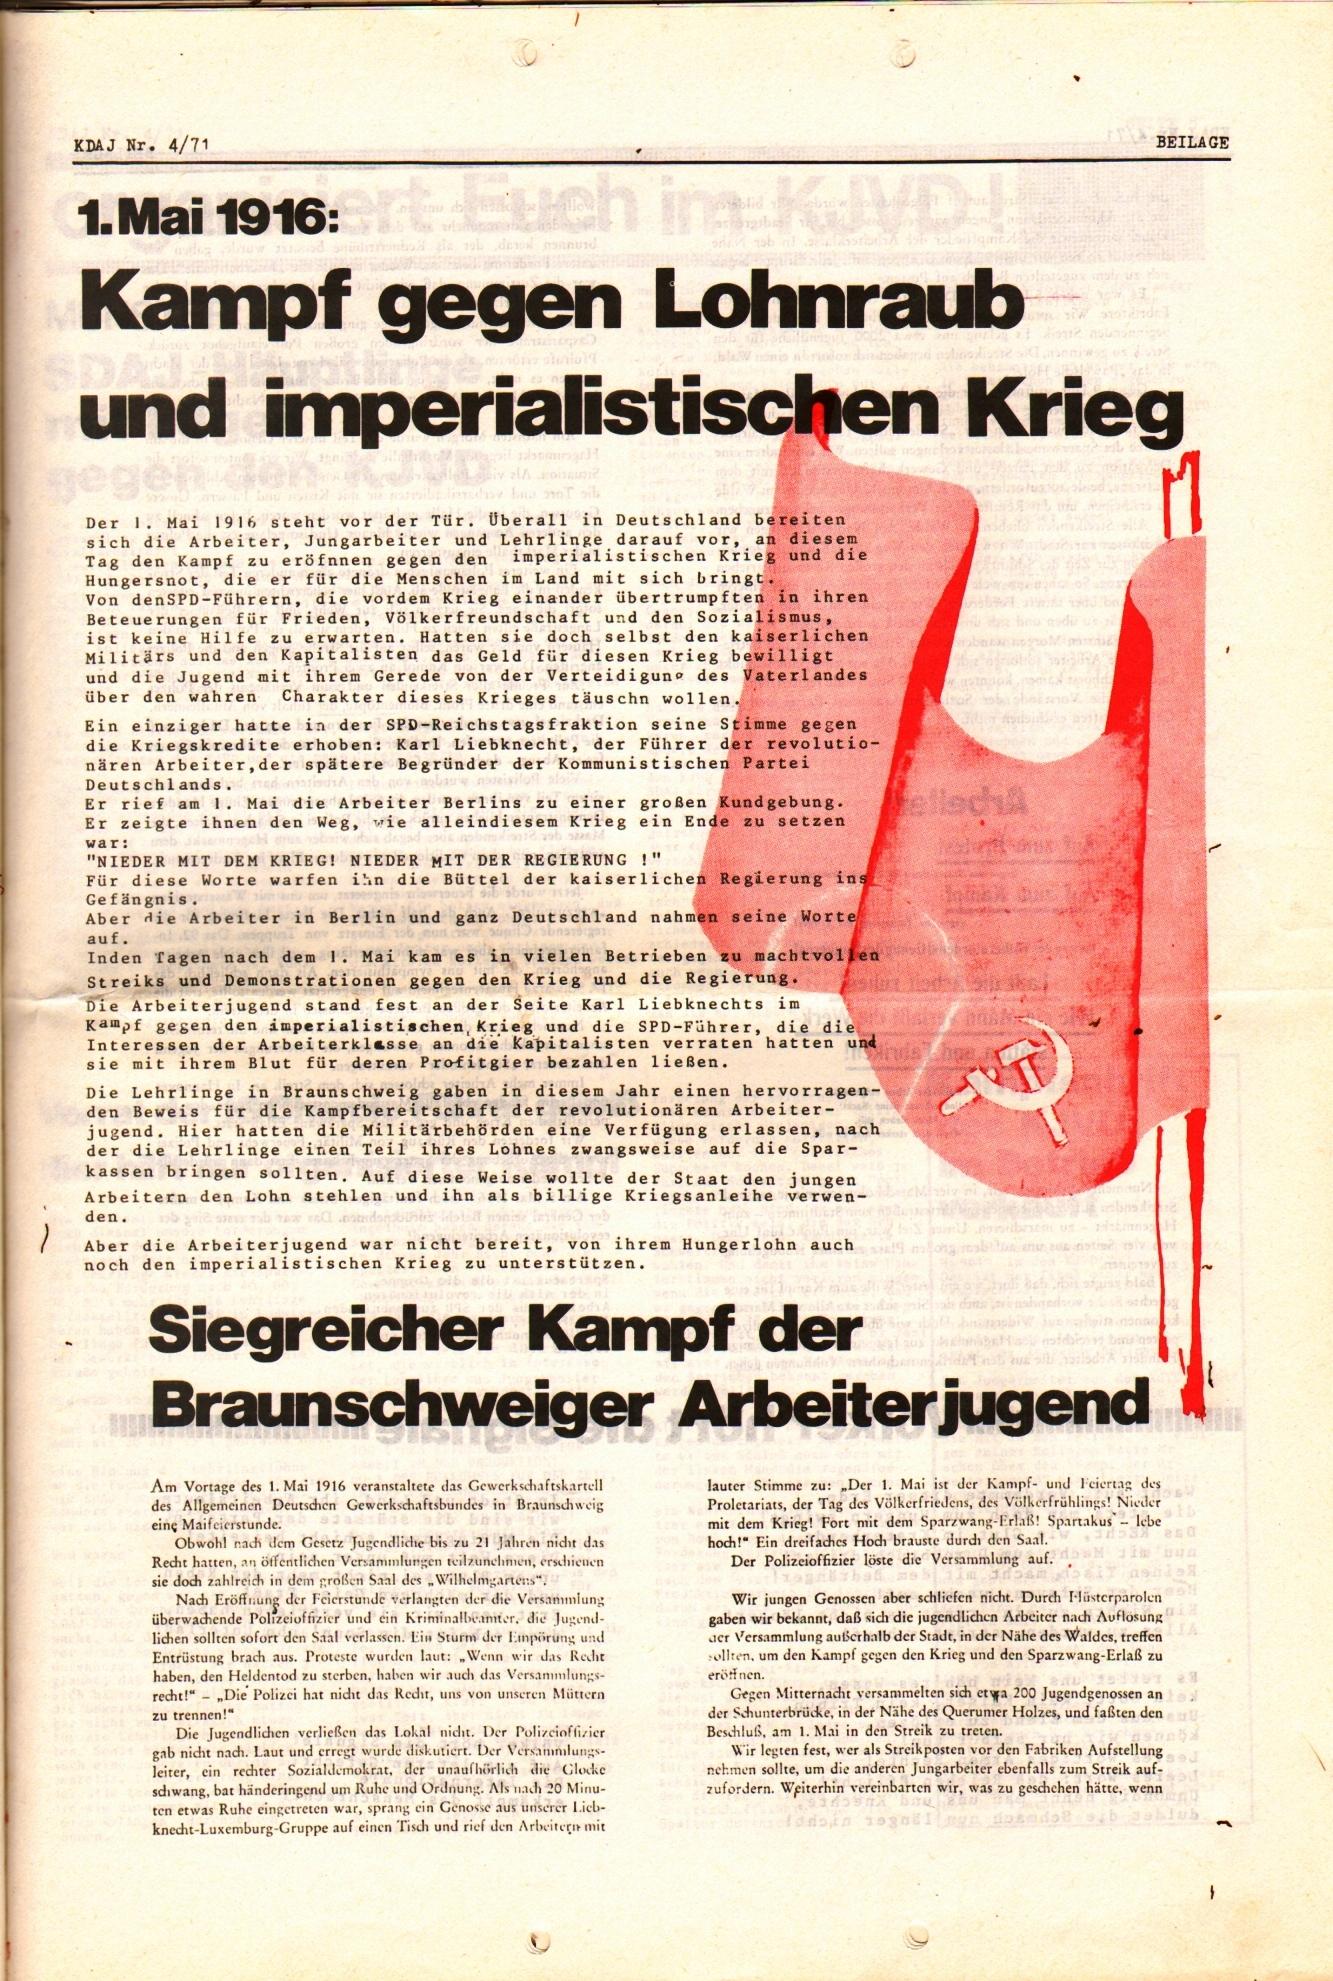 KDAJ, 2. Jg., April 1971, Nr. 4, Beilage, Seite 1